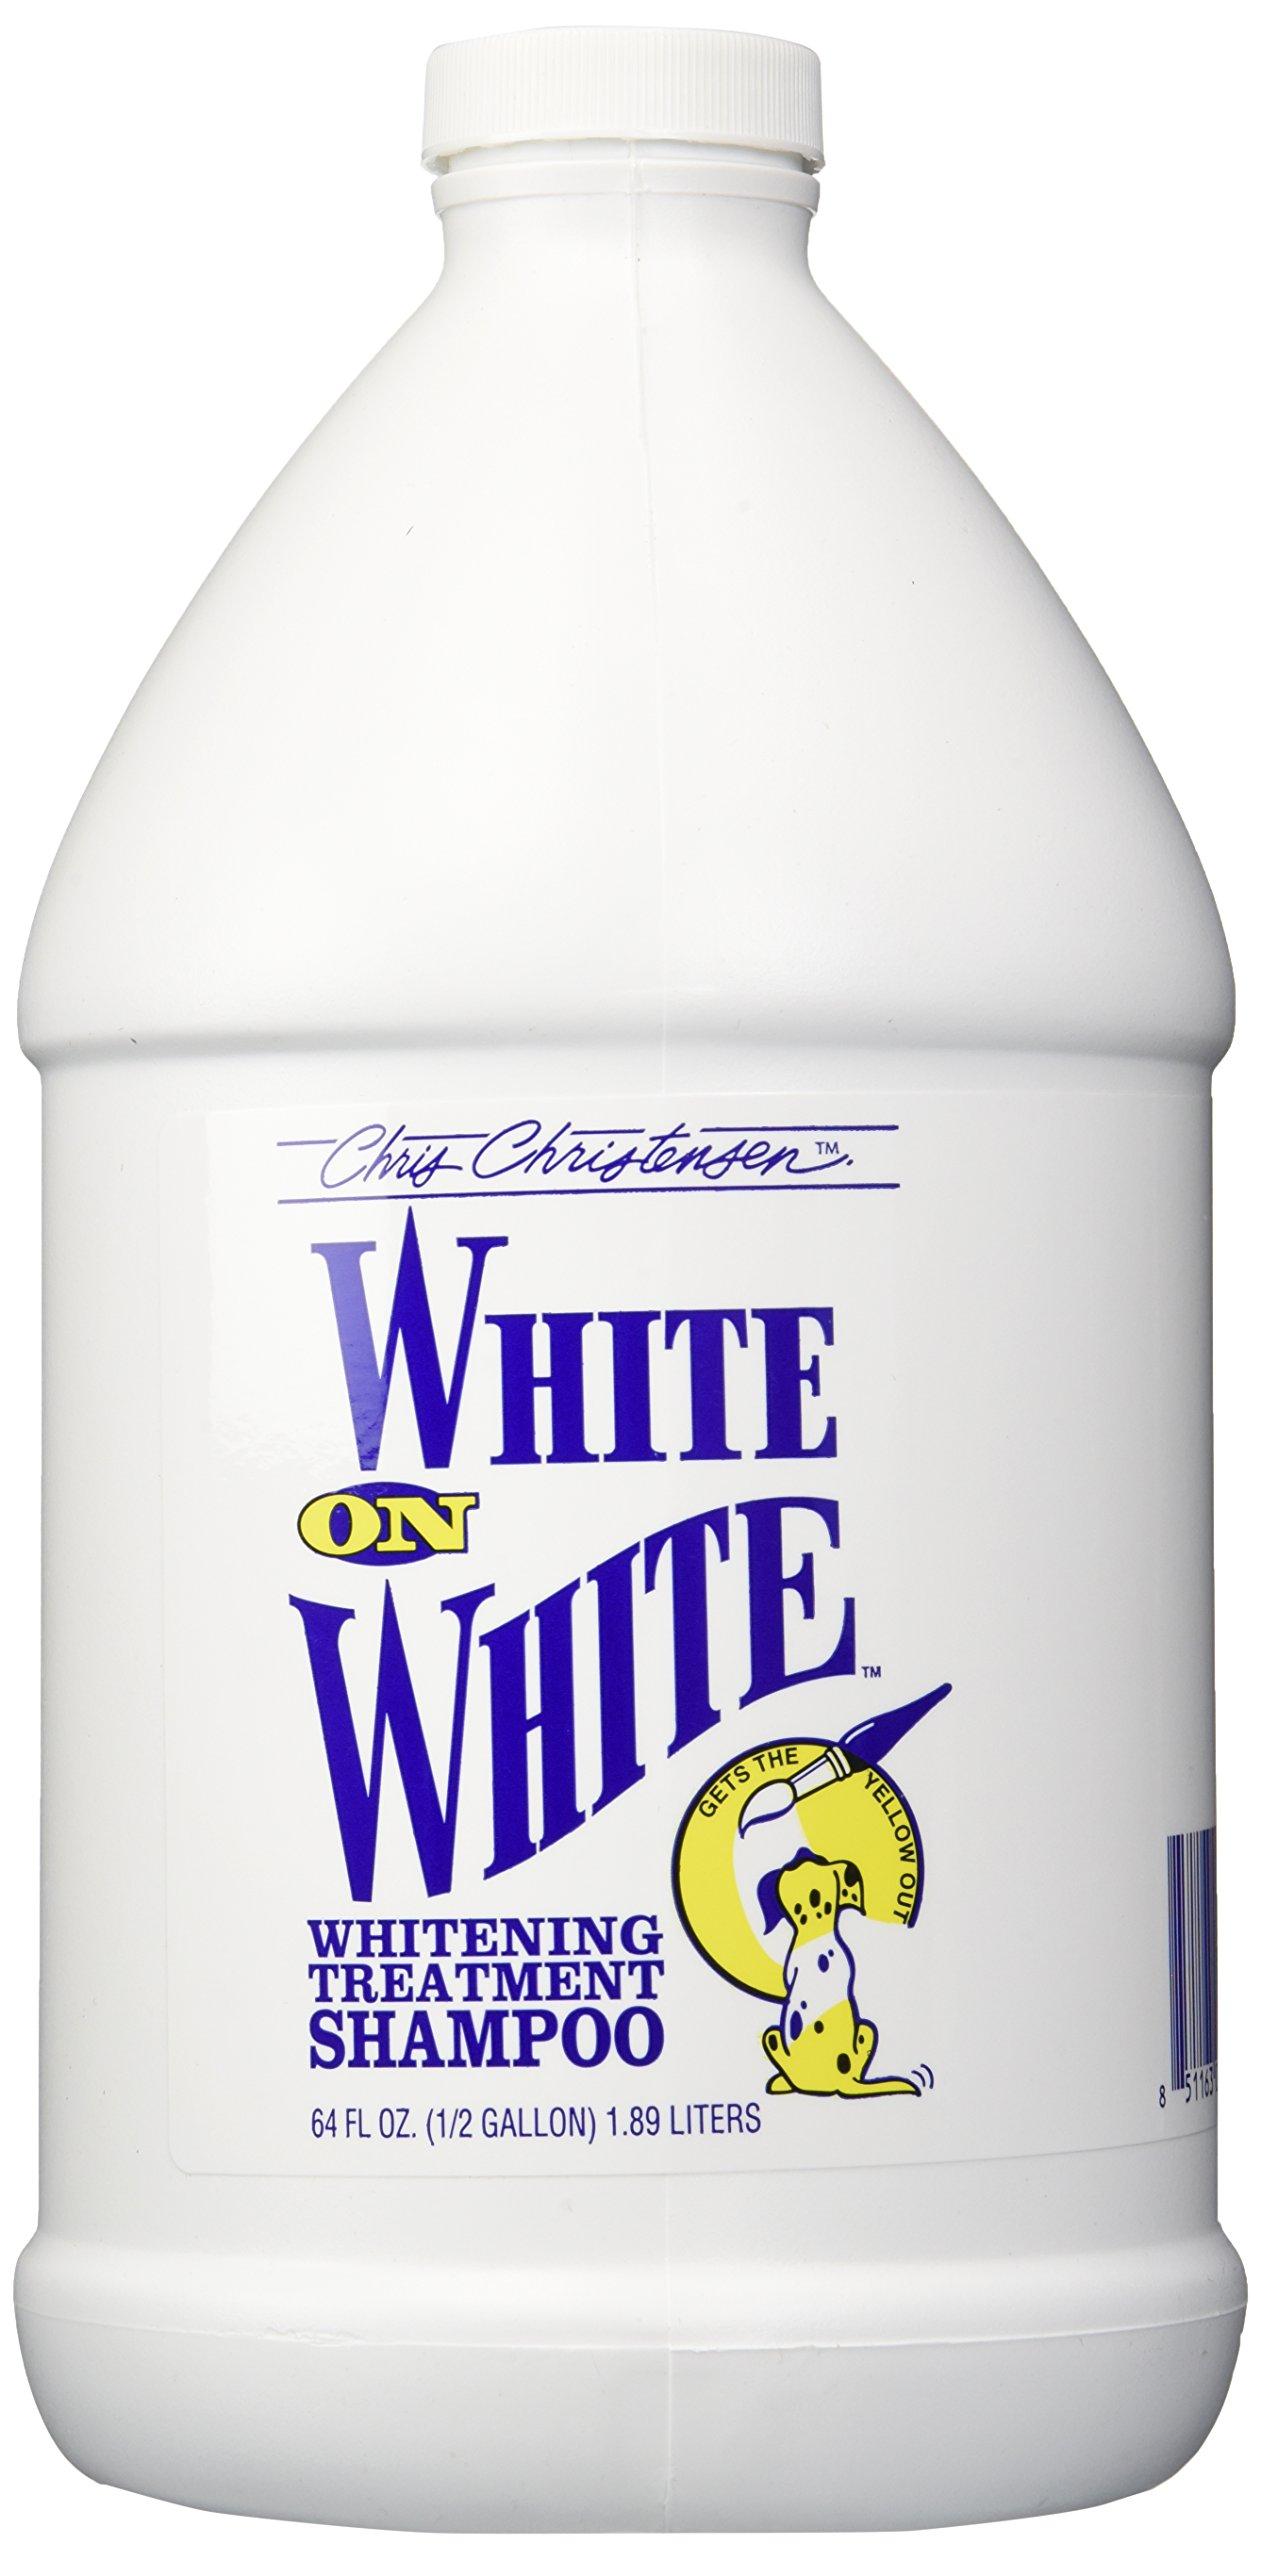 White on White Shampoo 64 oz by Chris Christensen by Chris Christensen